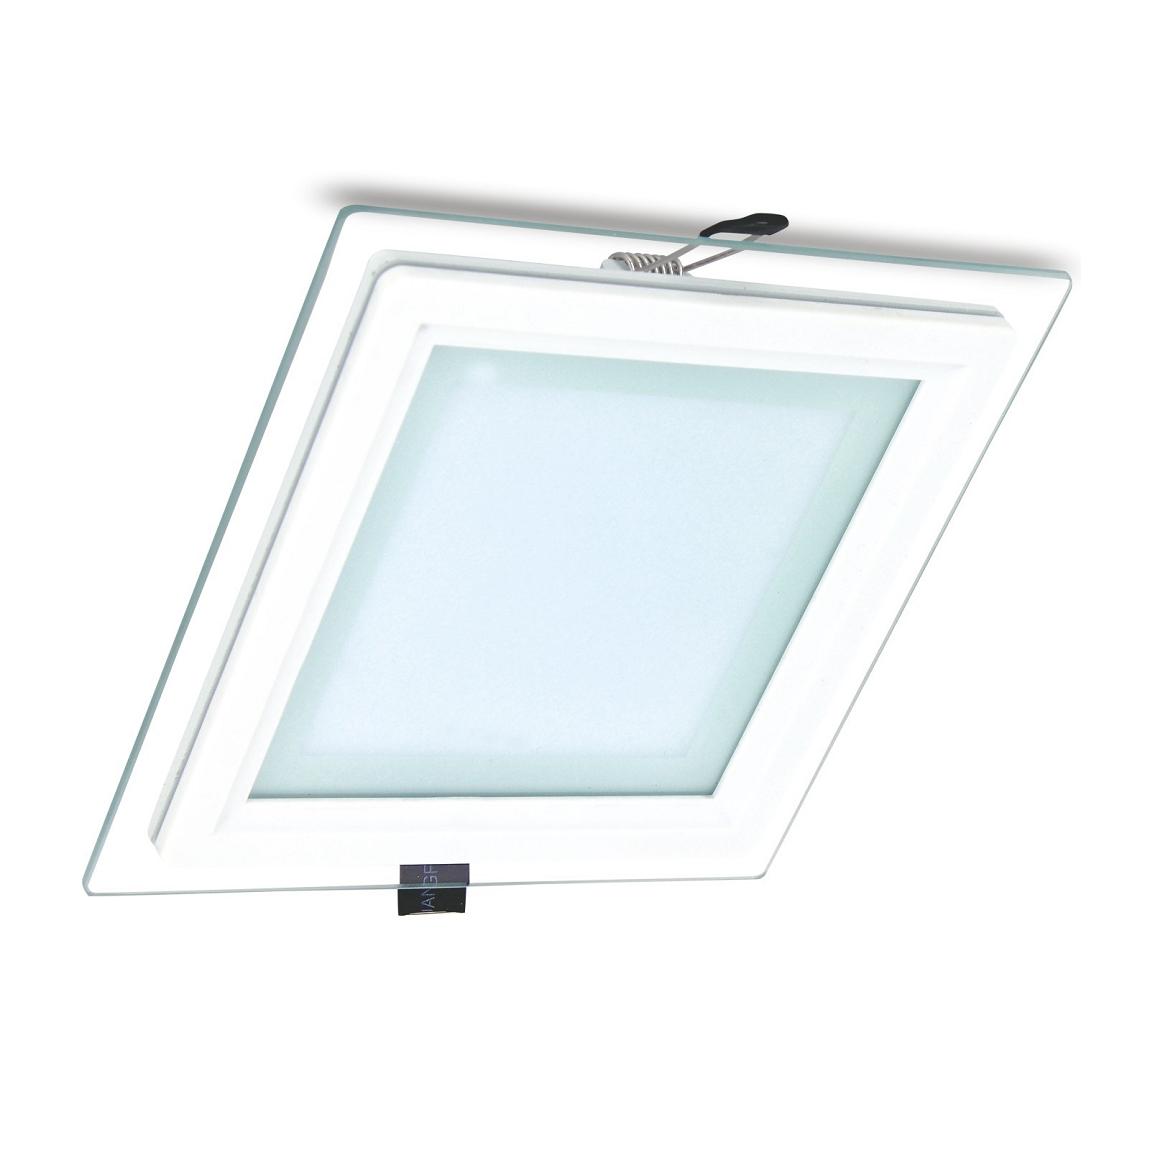 FORLIFE FL-2125 - 15 Watt Camlı Kasa Sıva Altı Kare LED Panel Armatür